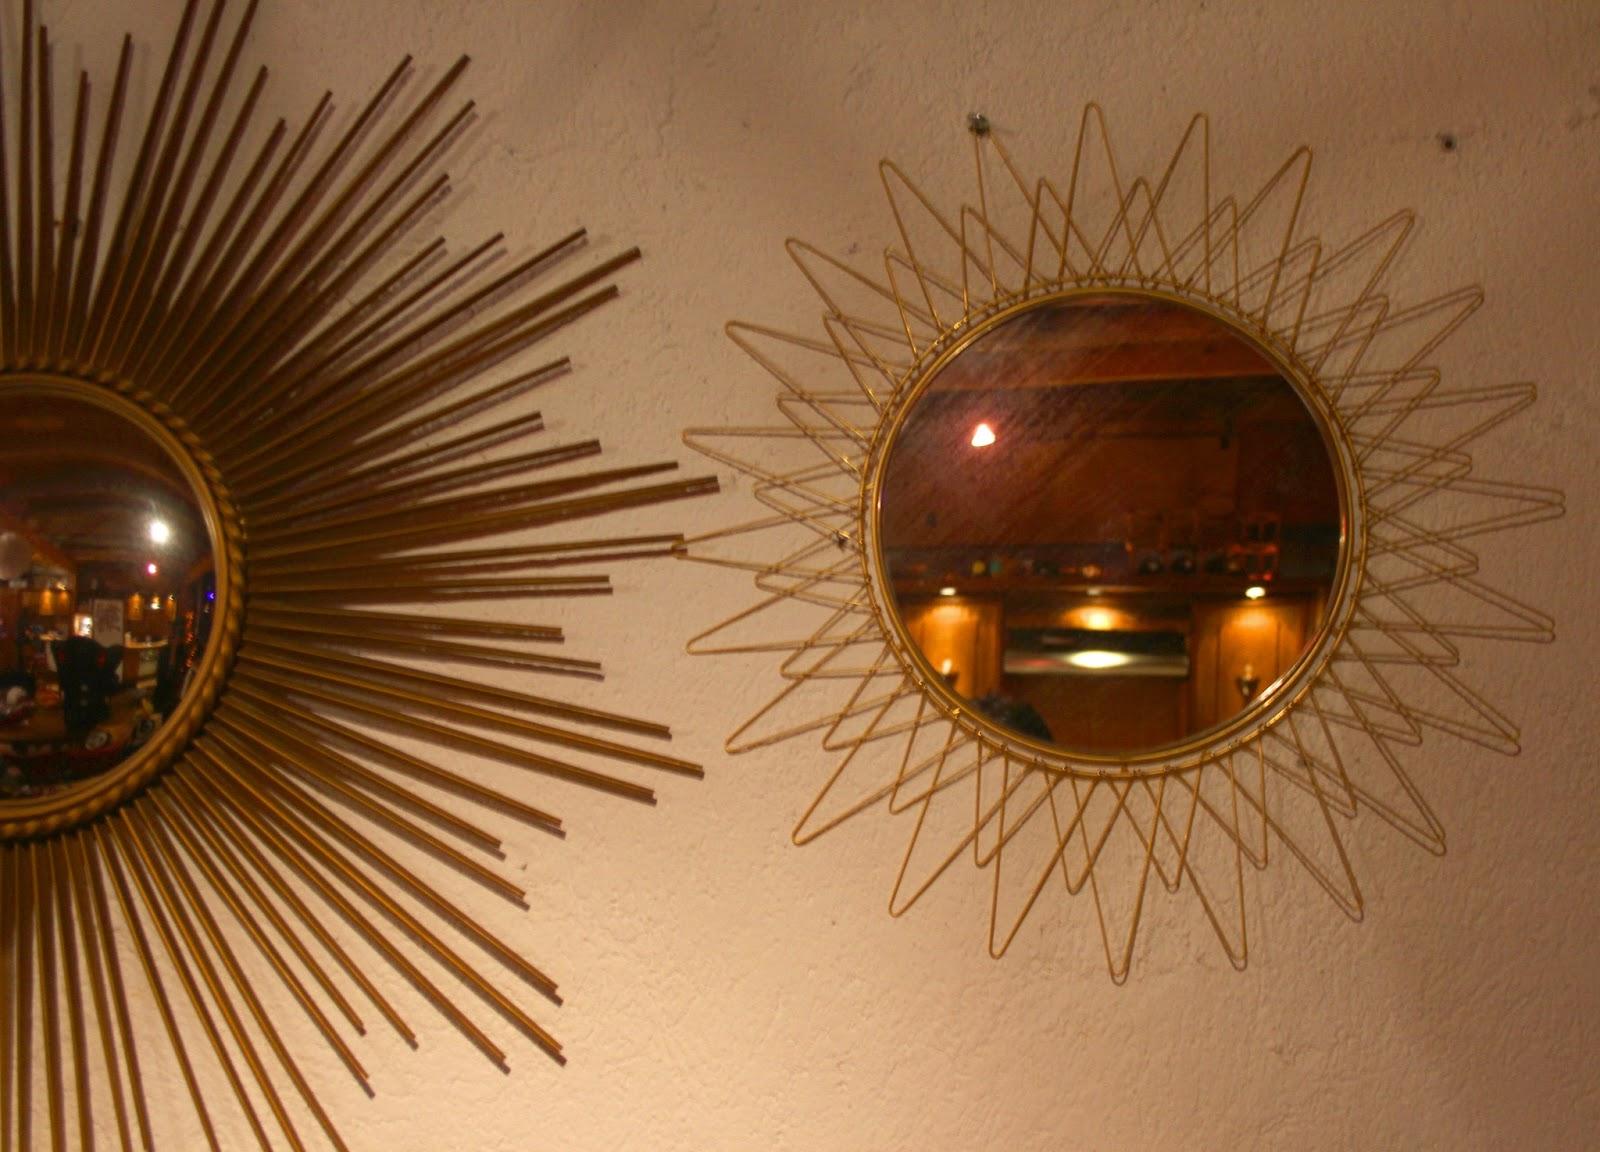 chicbaazar objets vintage 50 60 70 miroir soleil rayons pliables ann e 50 60 vintage. Black Bedroom Furniture Sets. Home Design Ideas